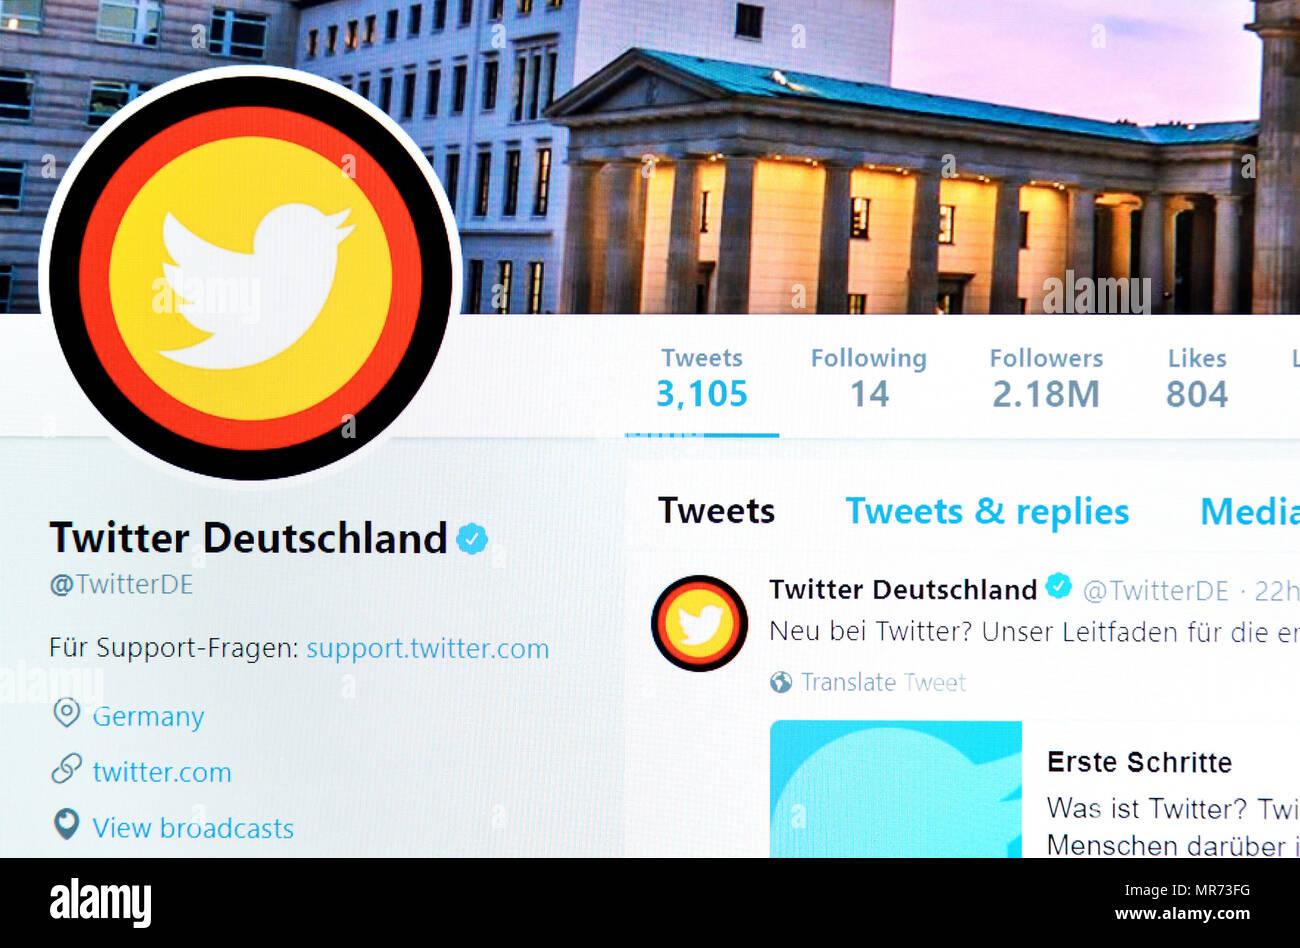 Twitter Deutschland official German Twitter page (2018) - Stock Image